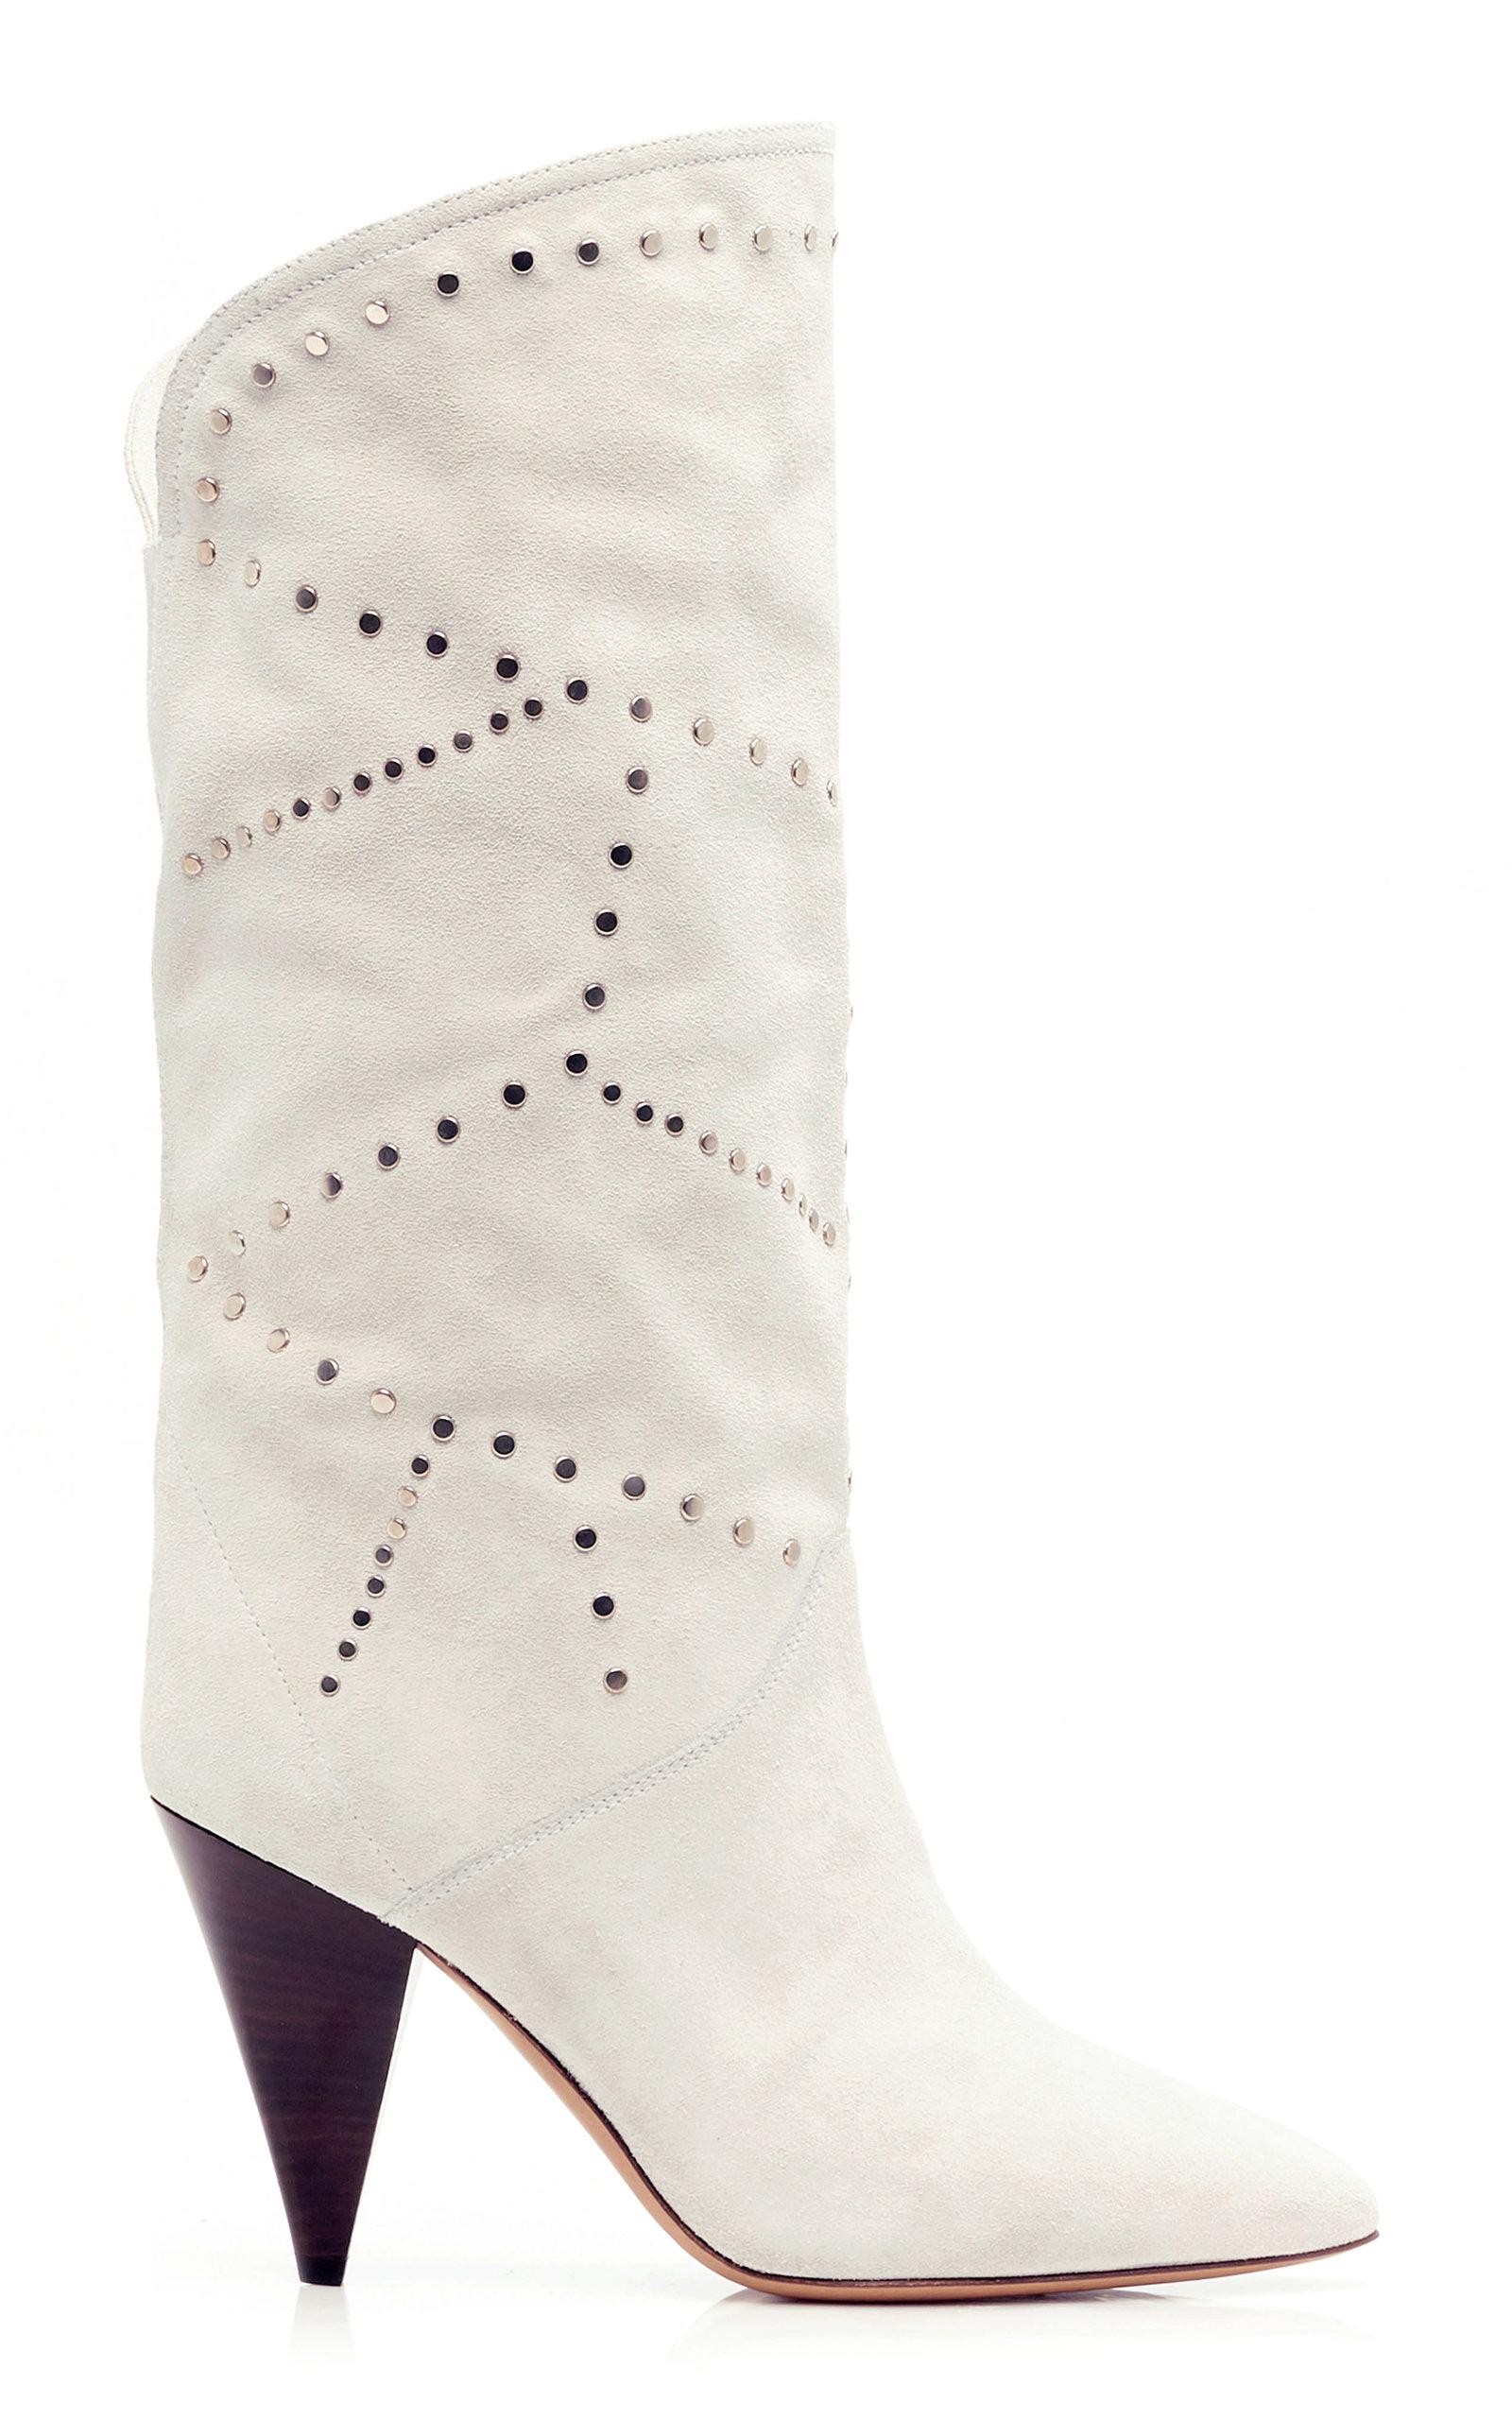 e0e83cde8b8 Lestee Perforated Leather Boots by Isabel Marant | Moda Operandi